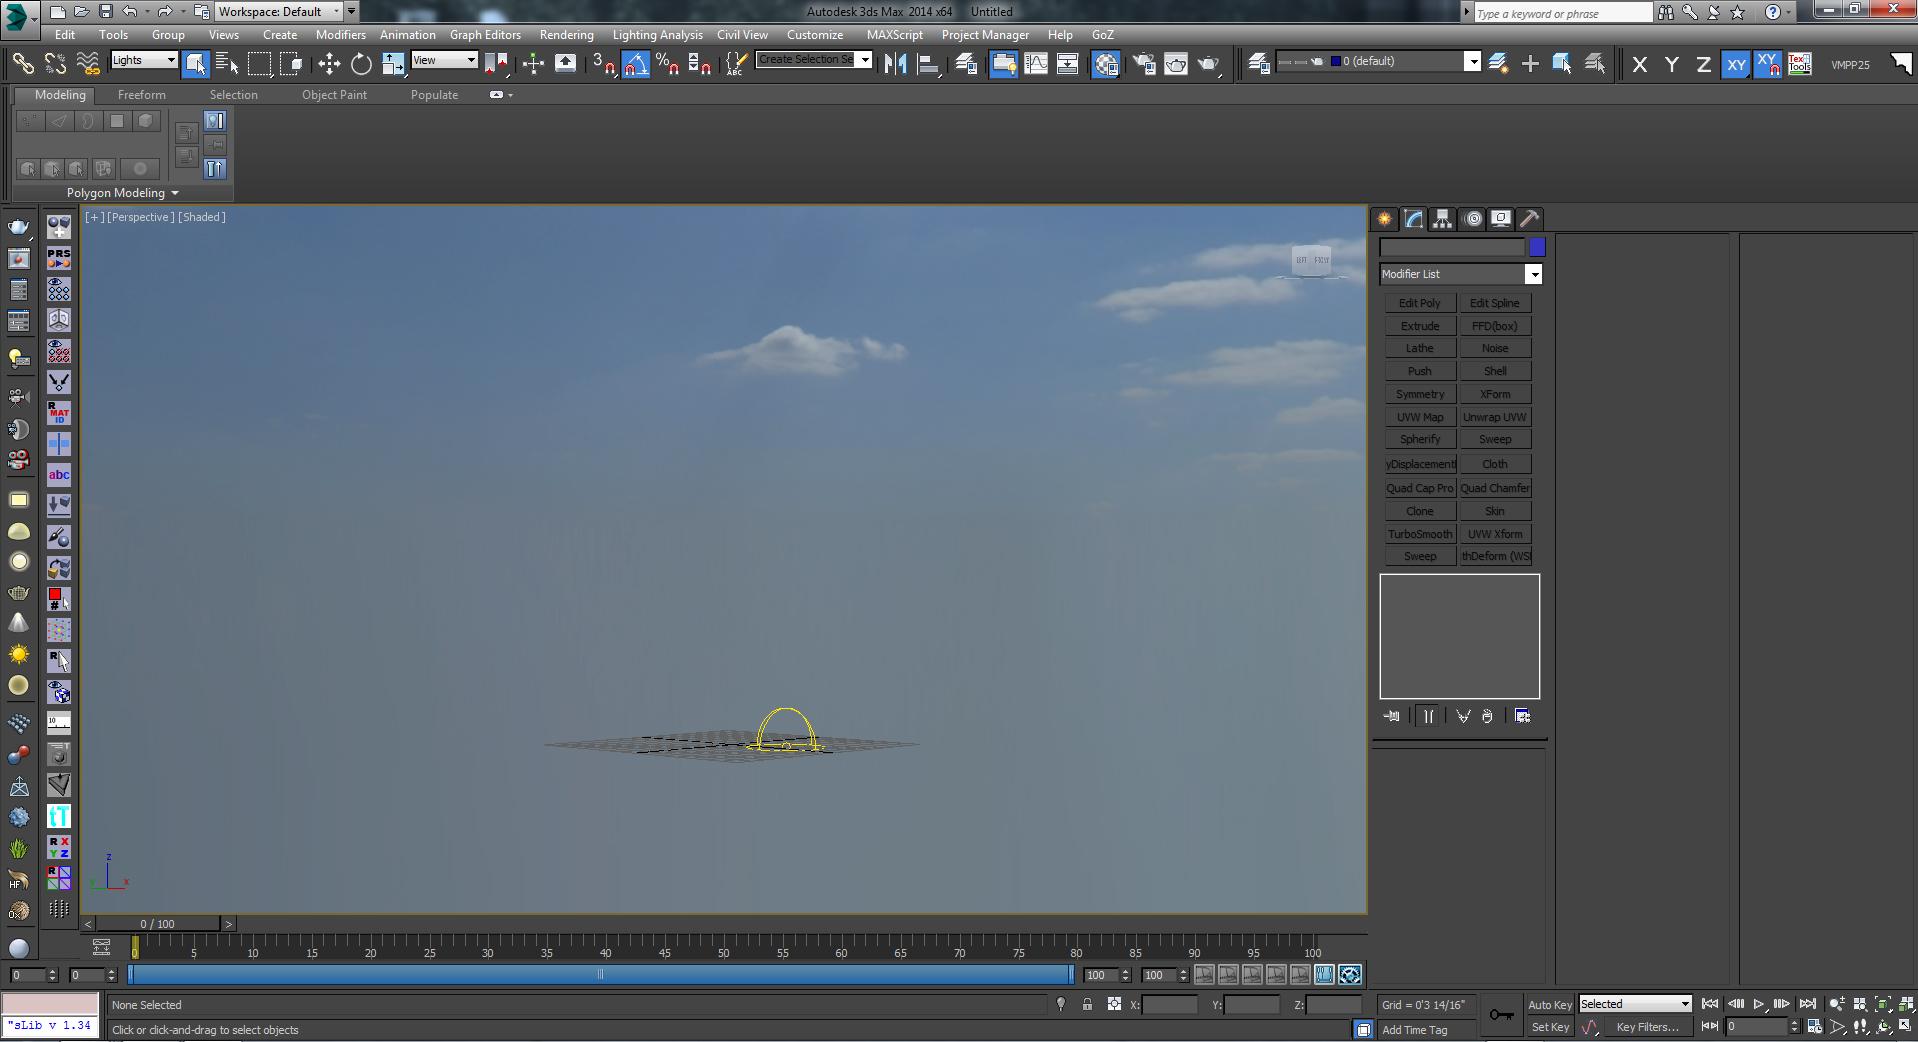 Lighting Architecture Interior Scenes with HDRI Images (3DS